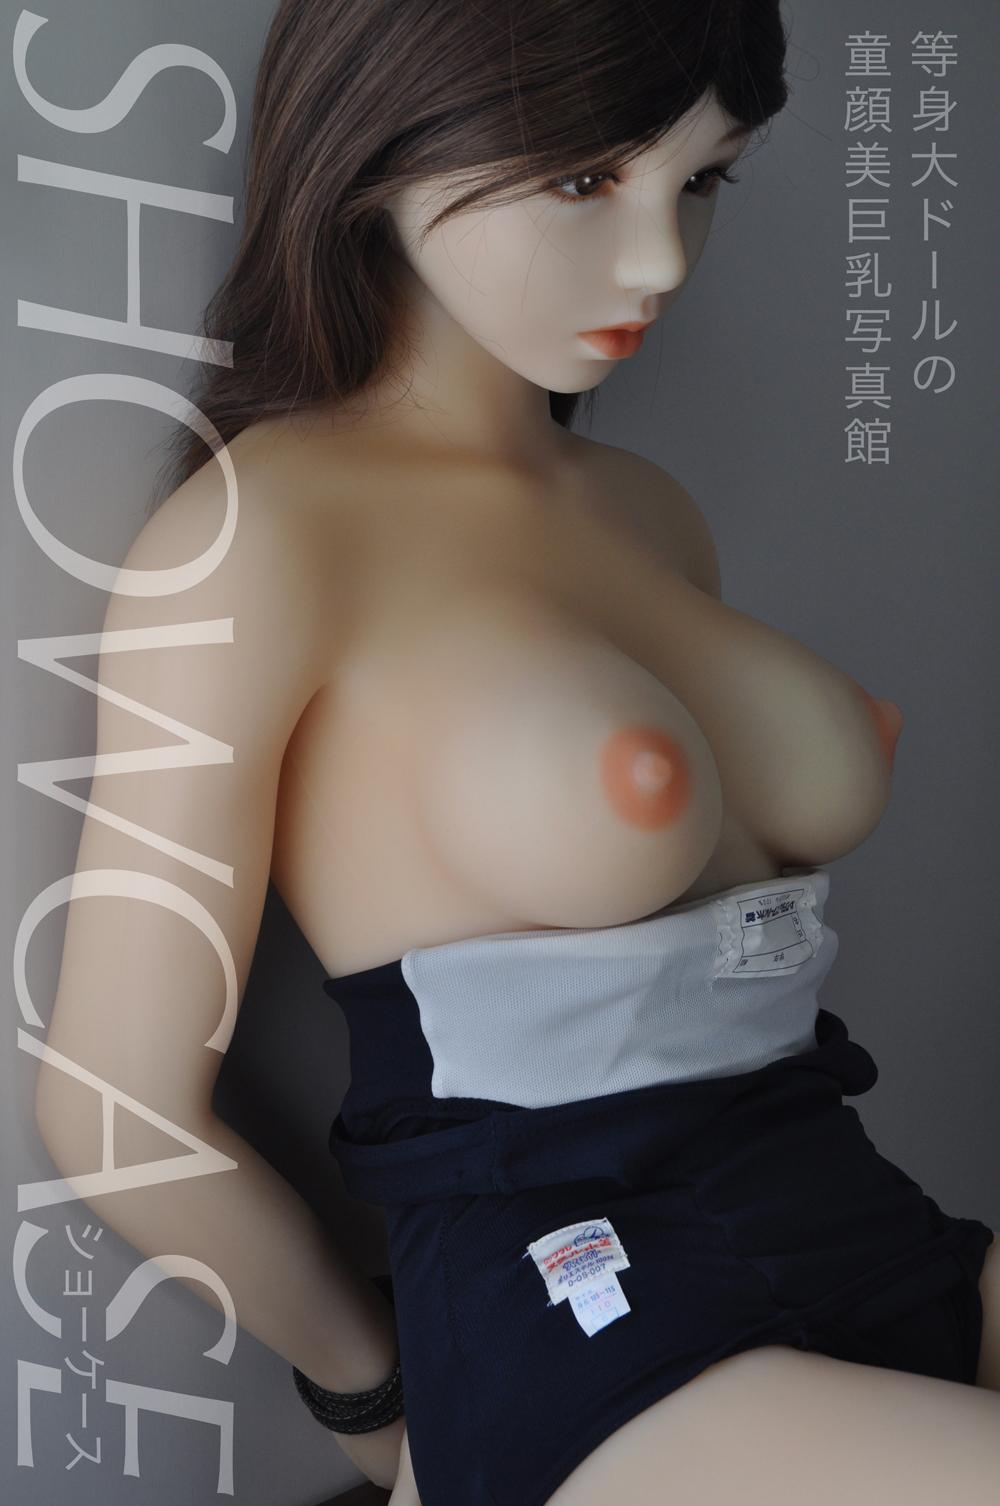 20151011073525fe4.jpg